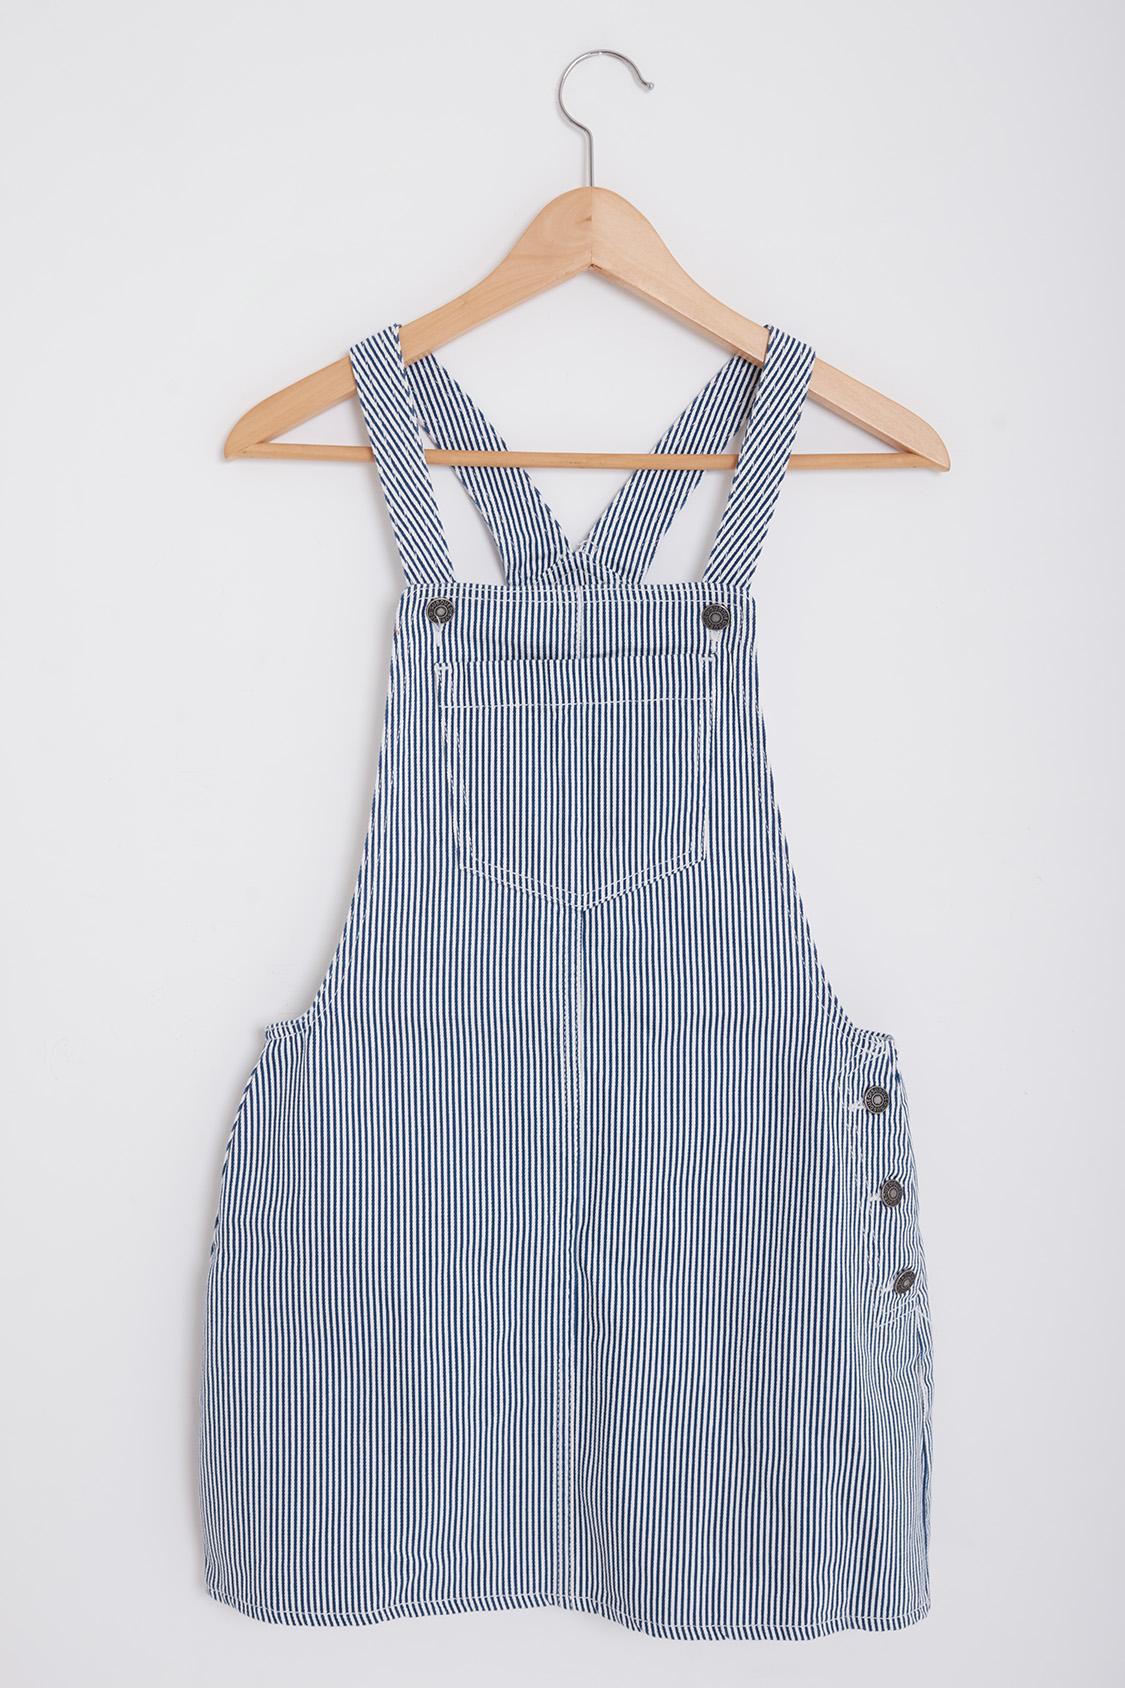 Striped dungaree dress